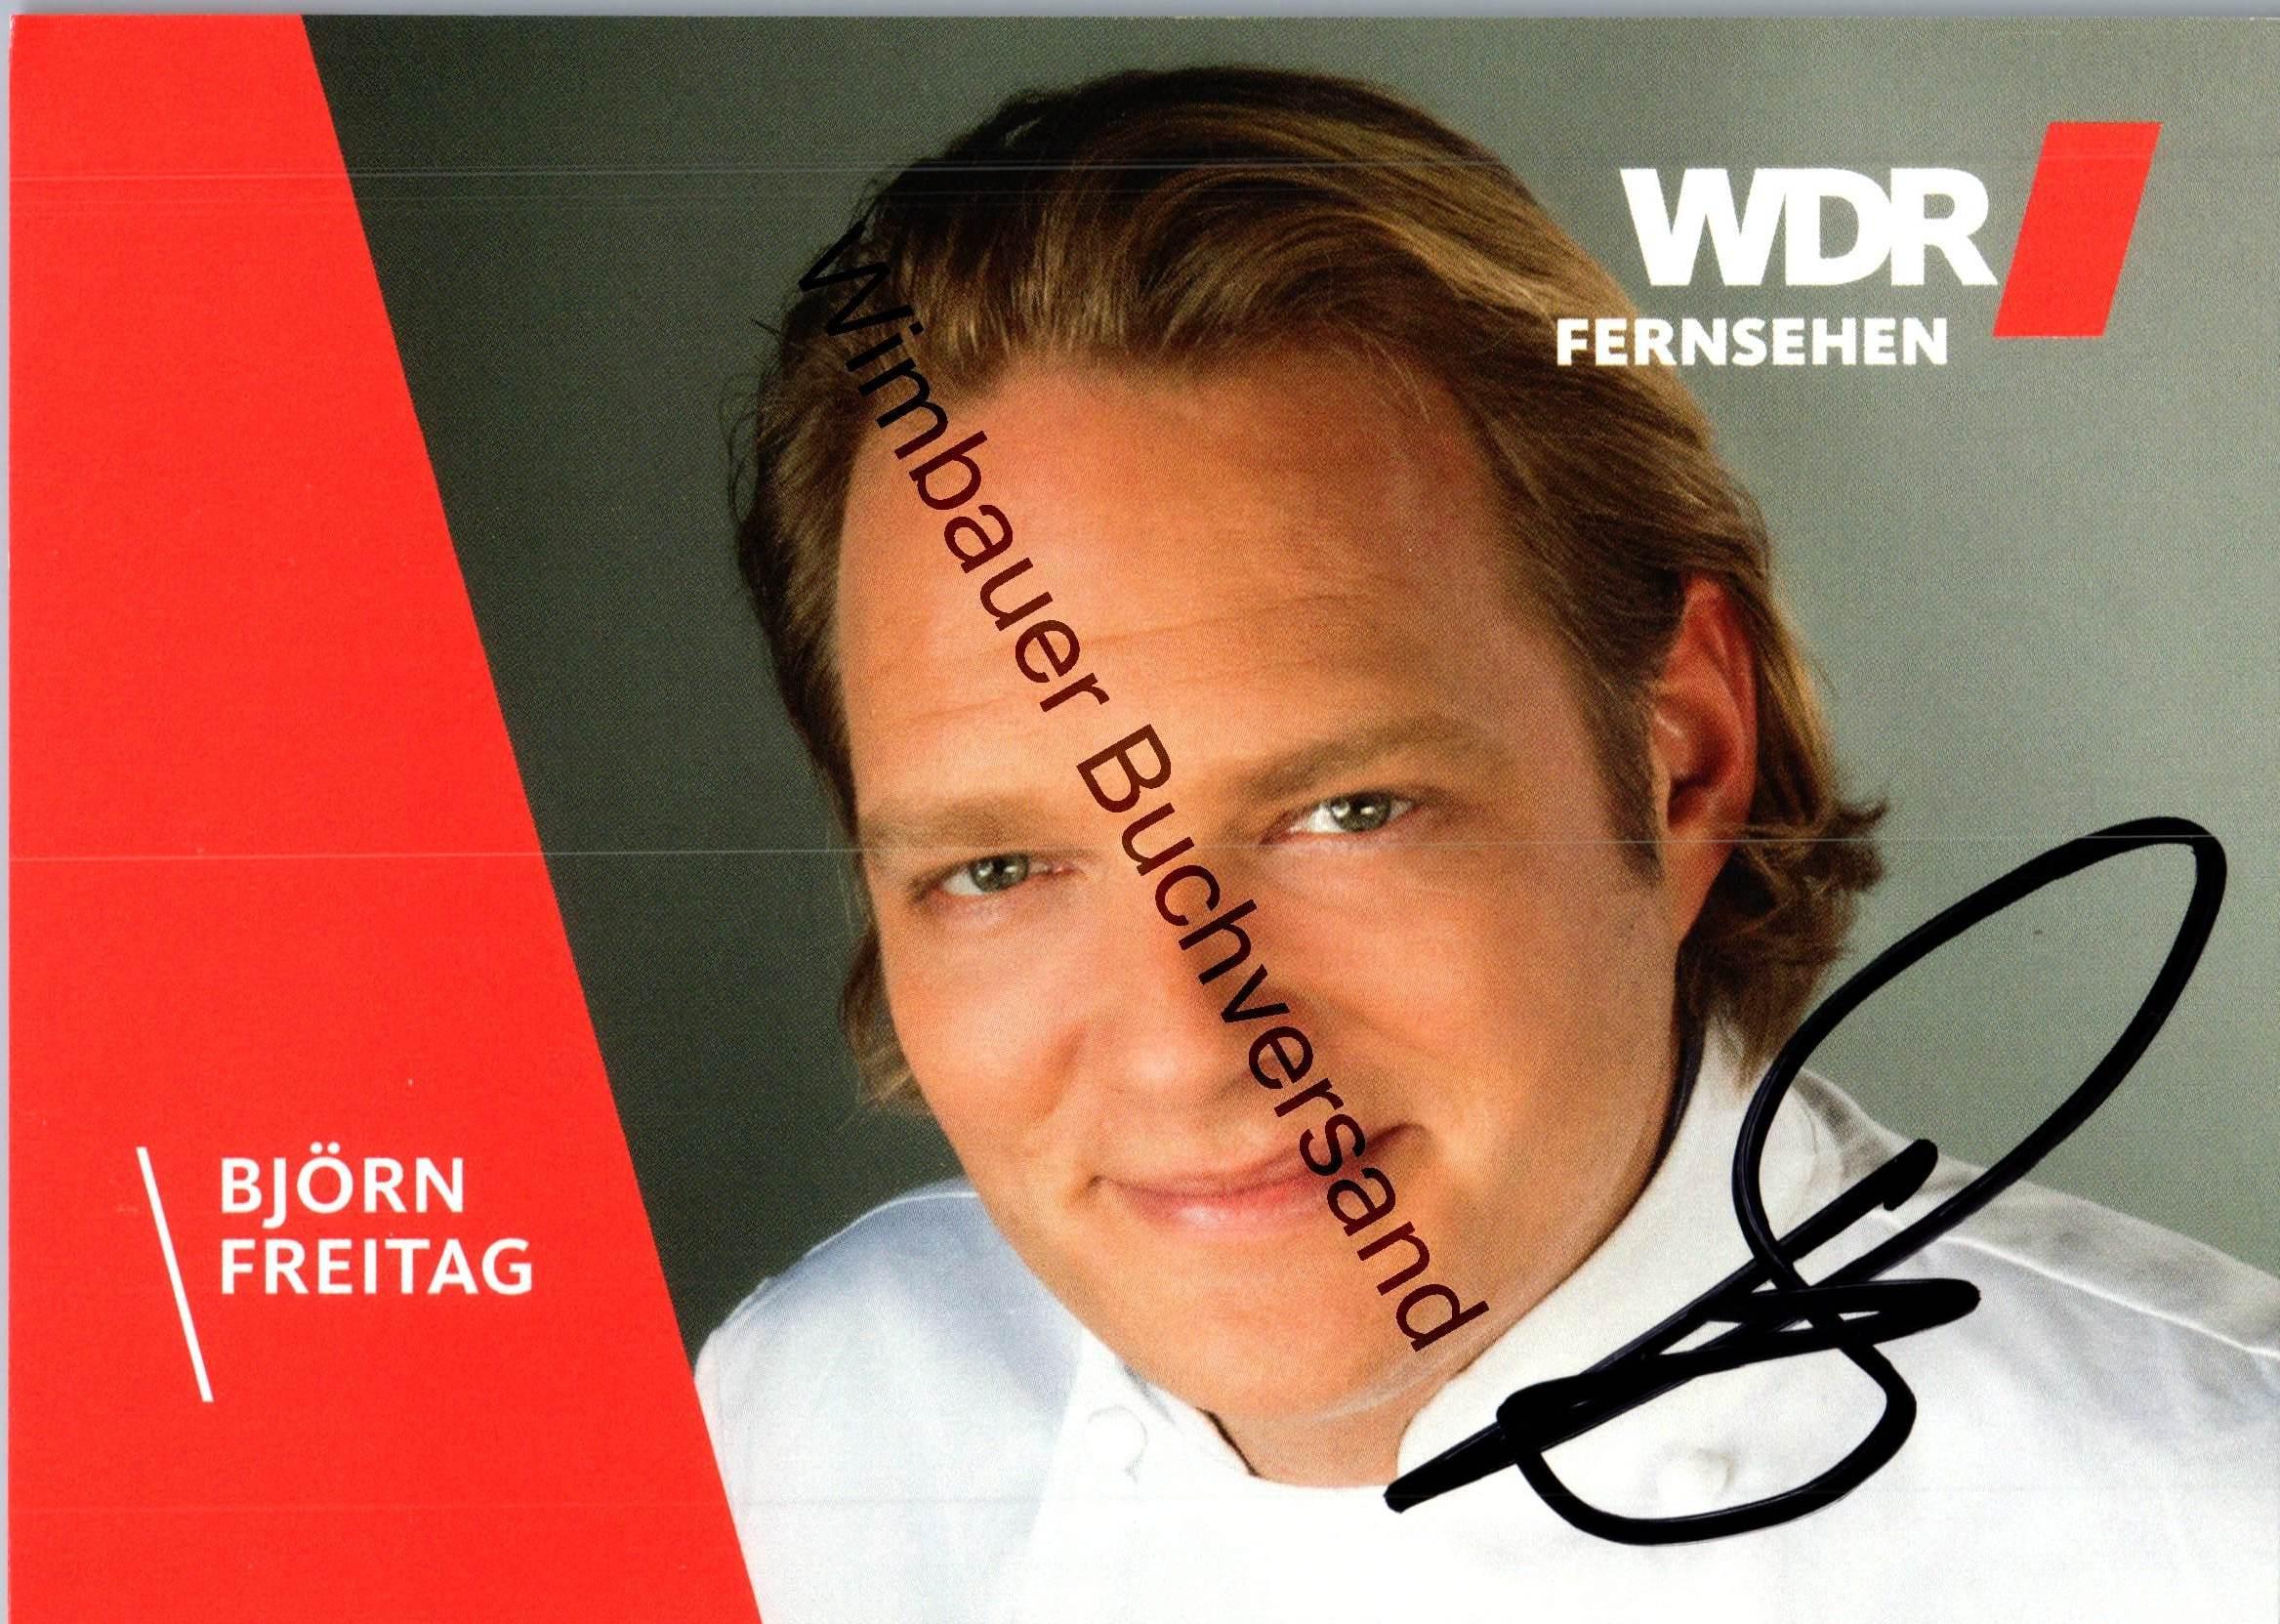 Original Autogramm Björn Freitag Fernsehkoch WDR /// Autogramm Autograph signiert signed signee